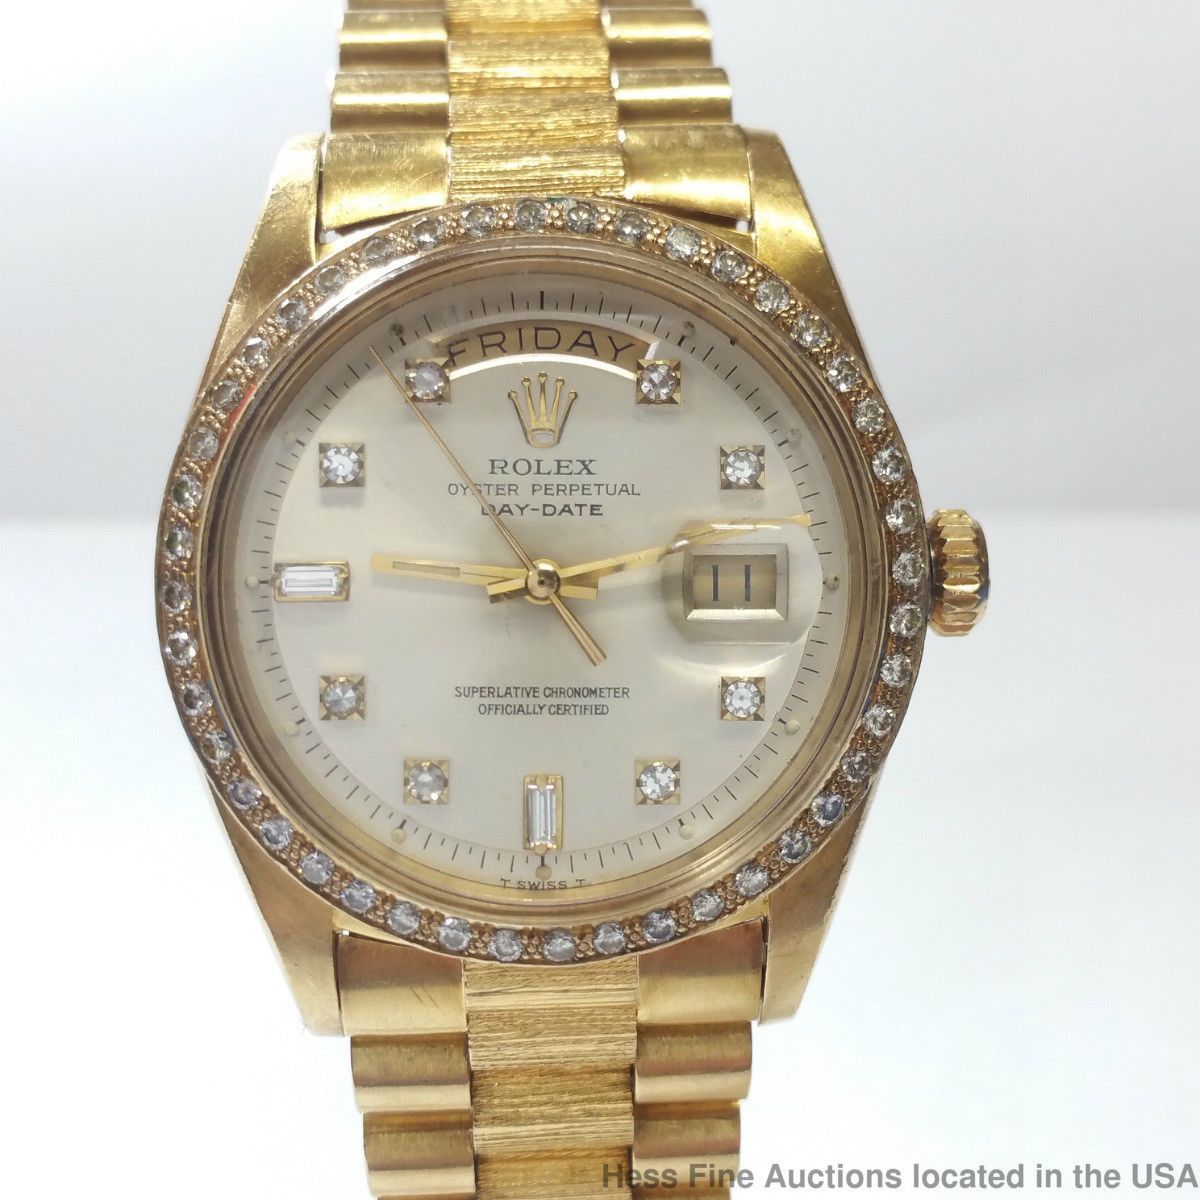 84e45a4ec6c4d #Forsale 1803 Cool Vintage 18k Gold #Rolex President Day Date W Diamond  Bezel Dial Watch #Auction @$6,600.00